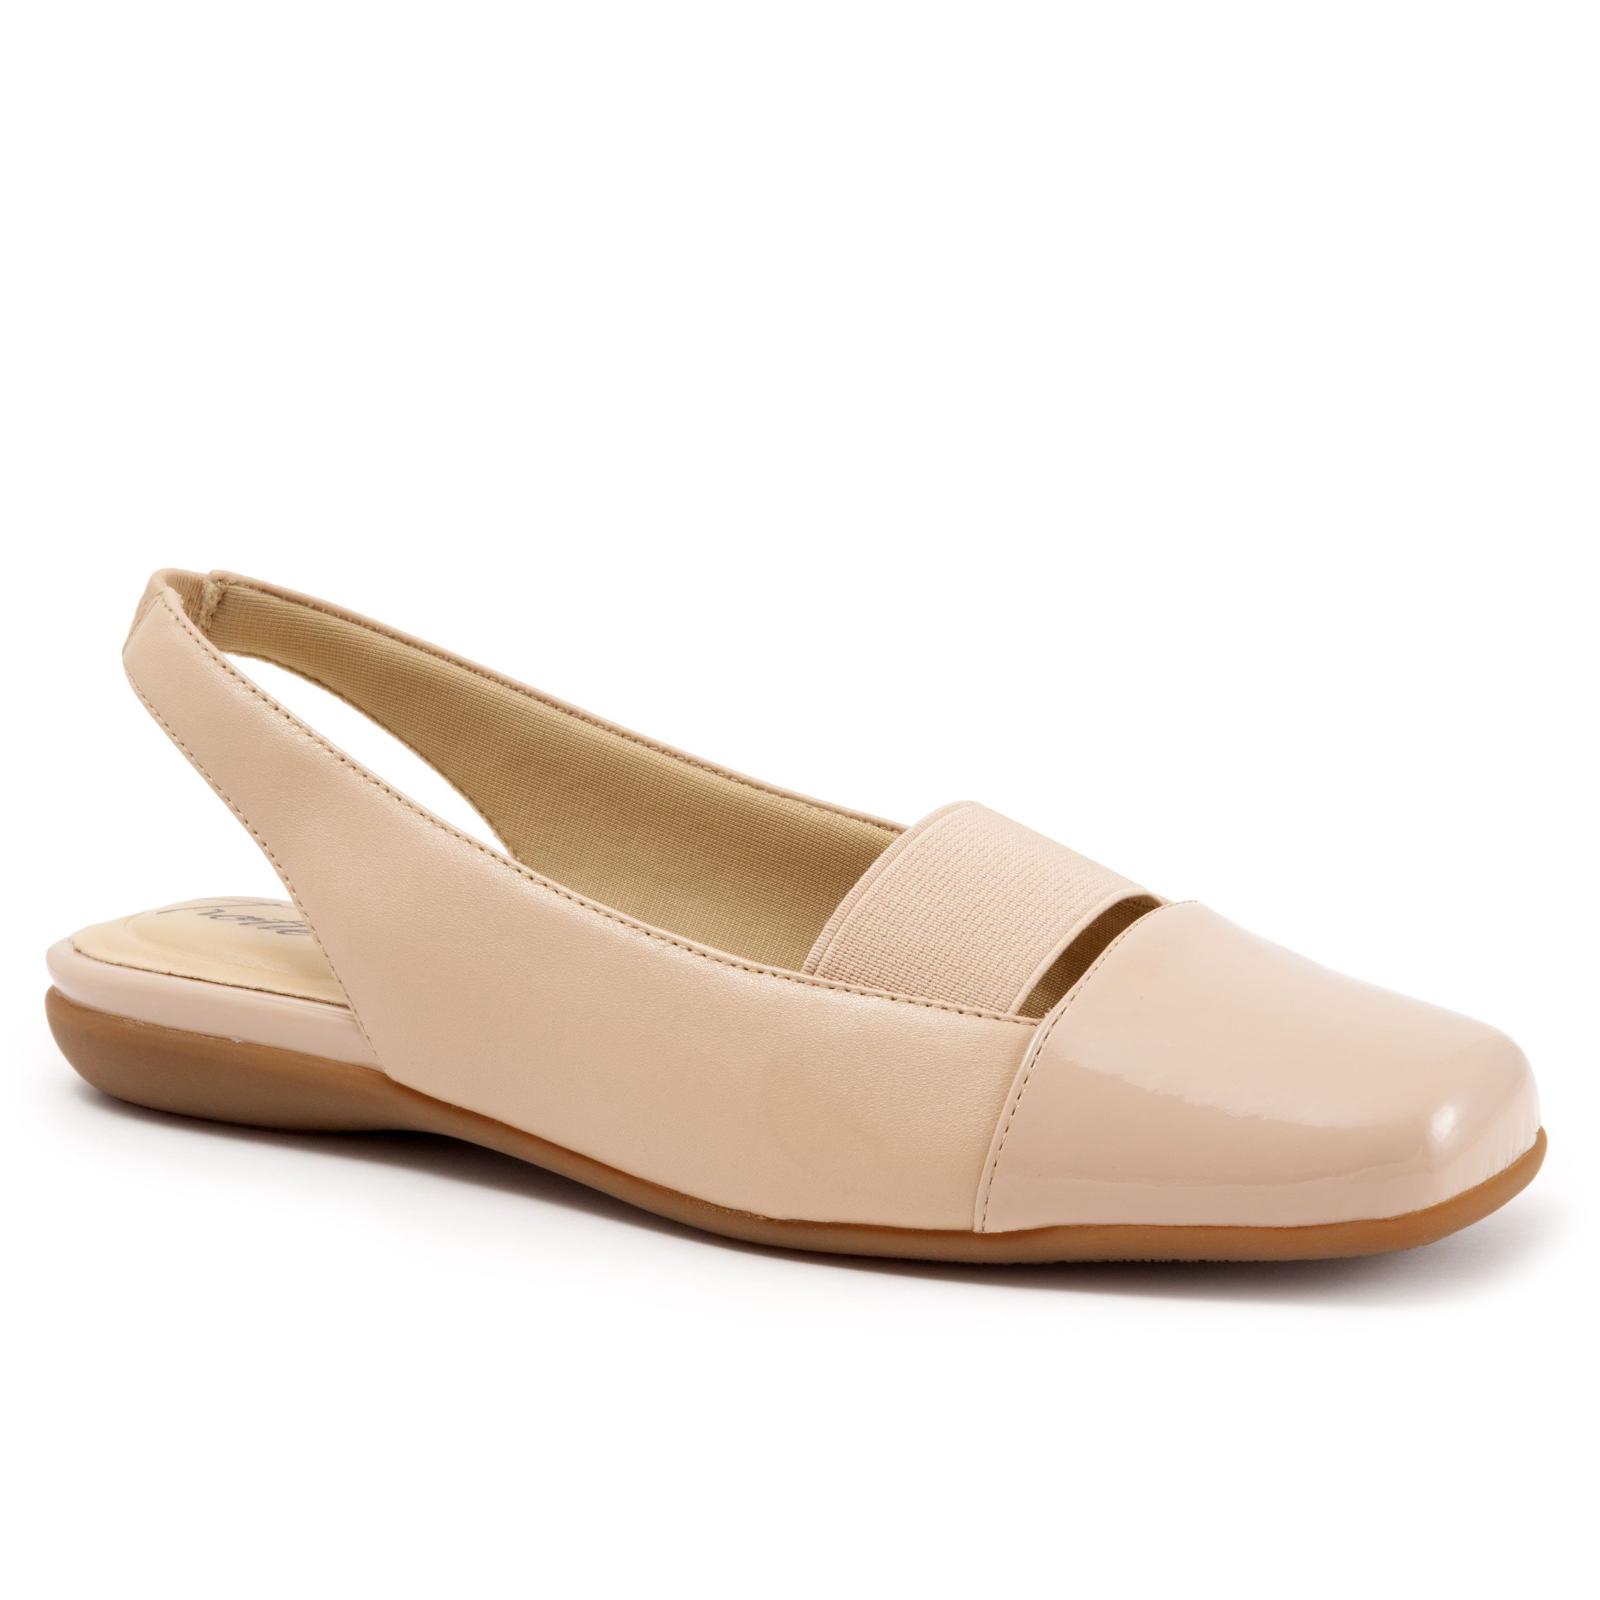 Damens's Trotters Sarina 9 Slingback Schuhe Nude Größe 9 Sarina Wide #NHHP0-M412 b03a32